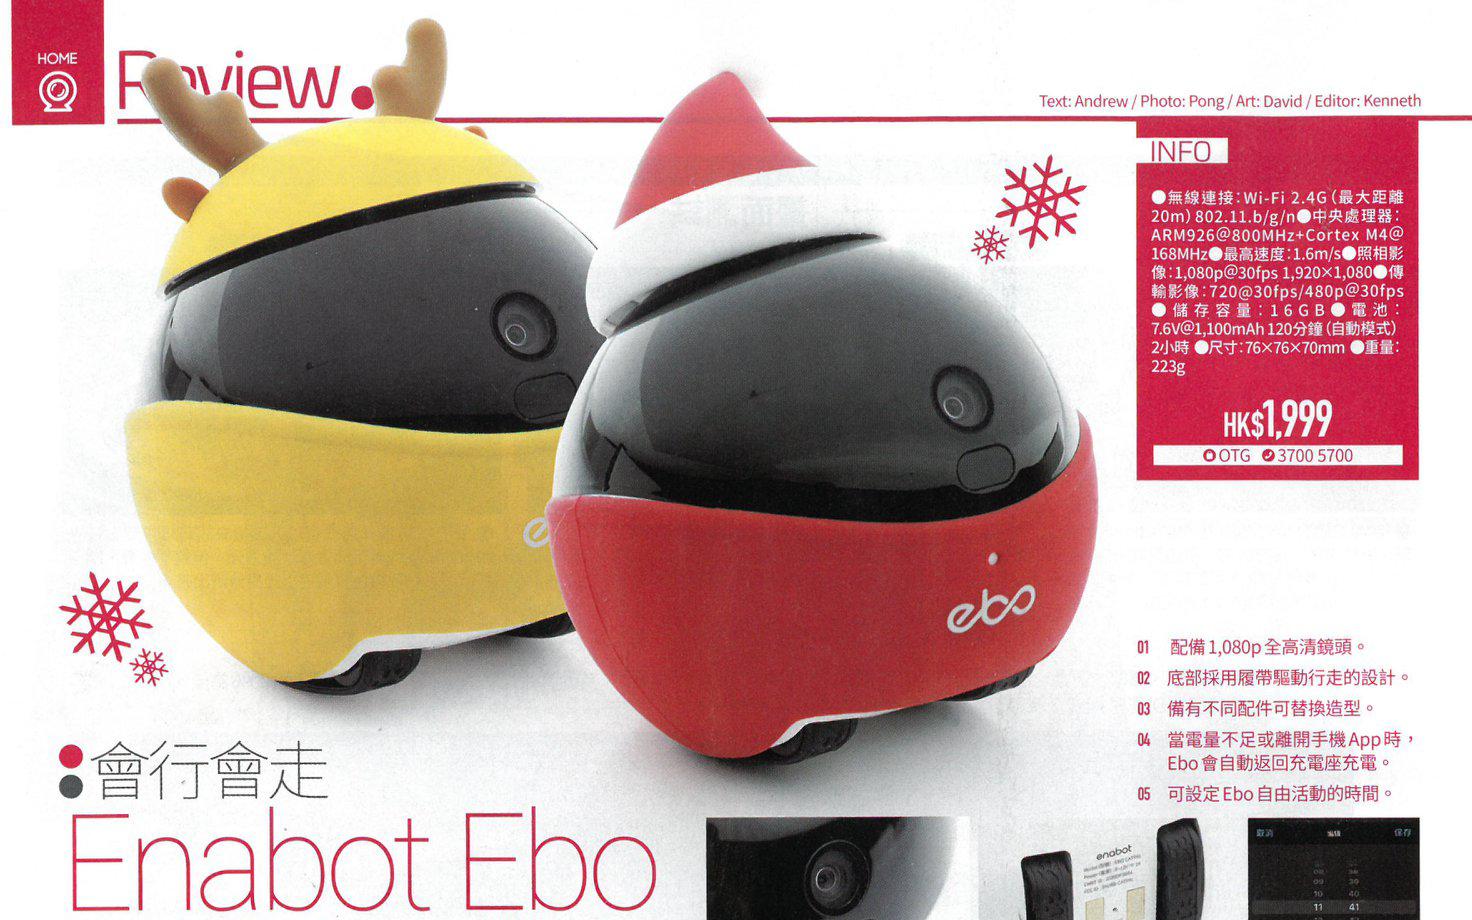 【Enabot - Ebo Catpal會行會走的遙控機械人@PC Market】